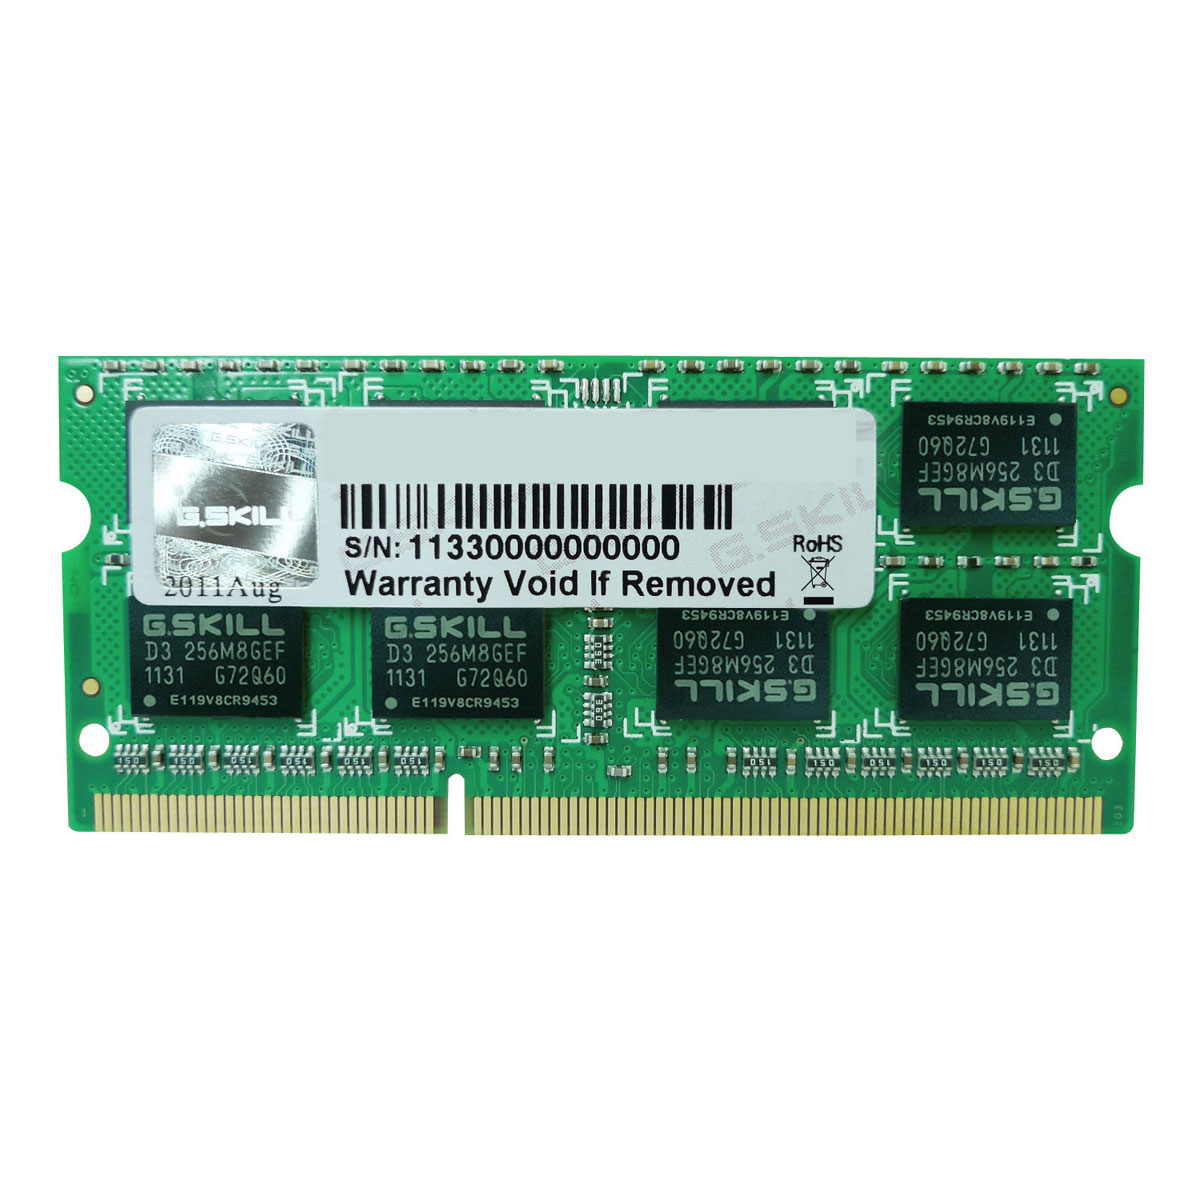 Mémoire PC portable G.Skill SO-DIMM 8 Go DDR3 1333 MHz CL9 RAM SO-DIMM PC3-10600 - F3-1333C9S-8GSL (garantie à vie par G.Skill)